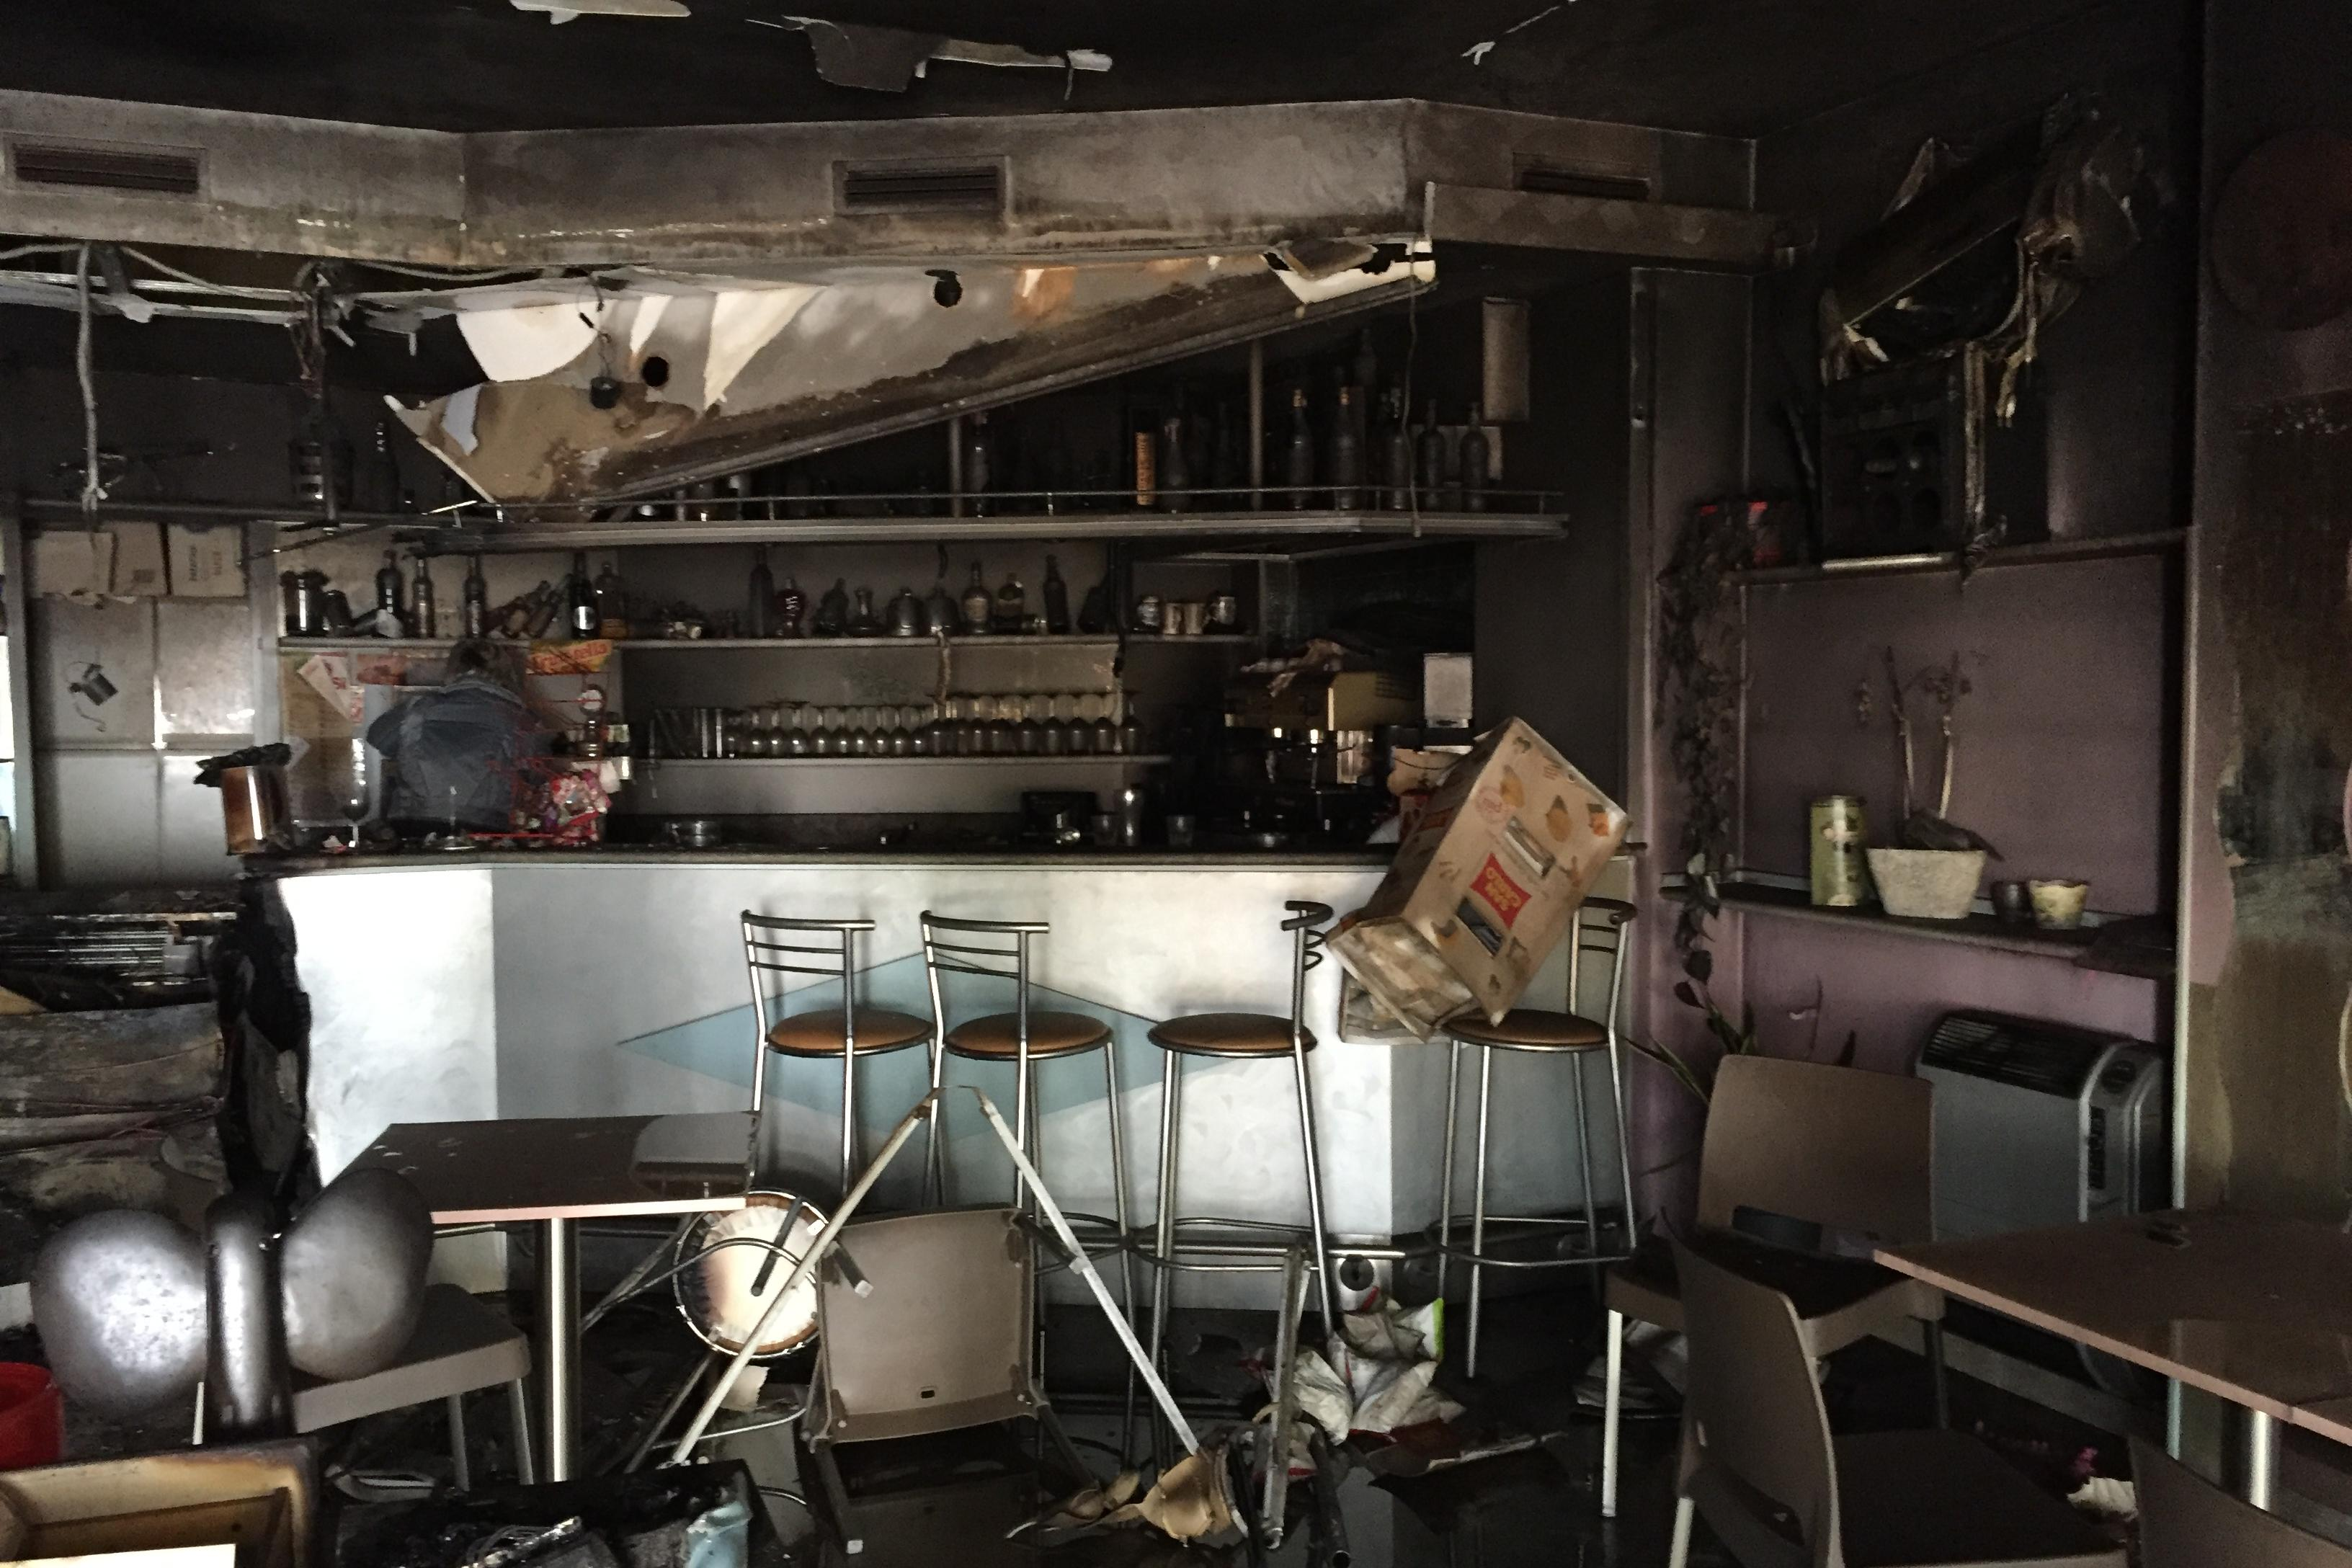 Risultati immagini per L'incendio al bar manhattan